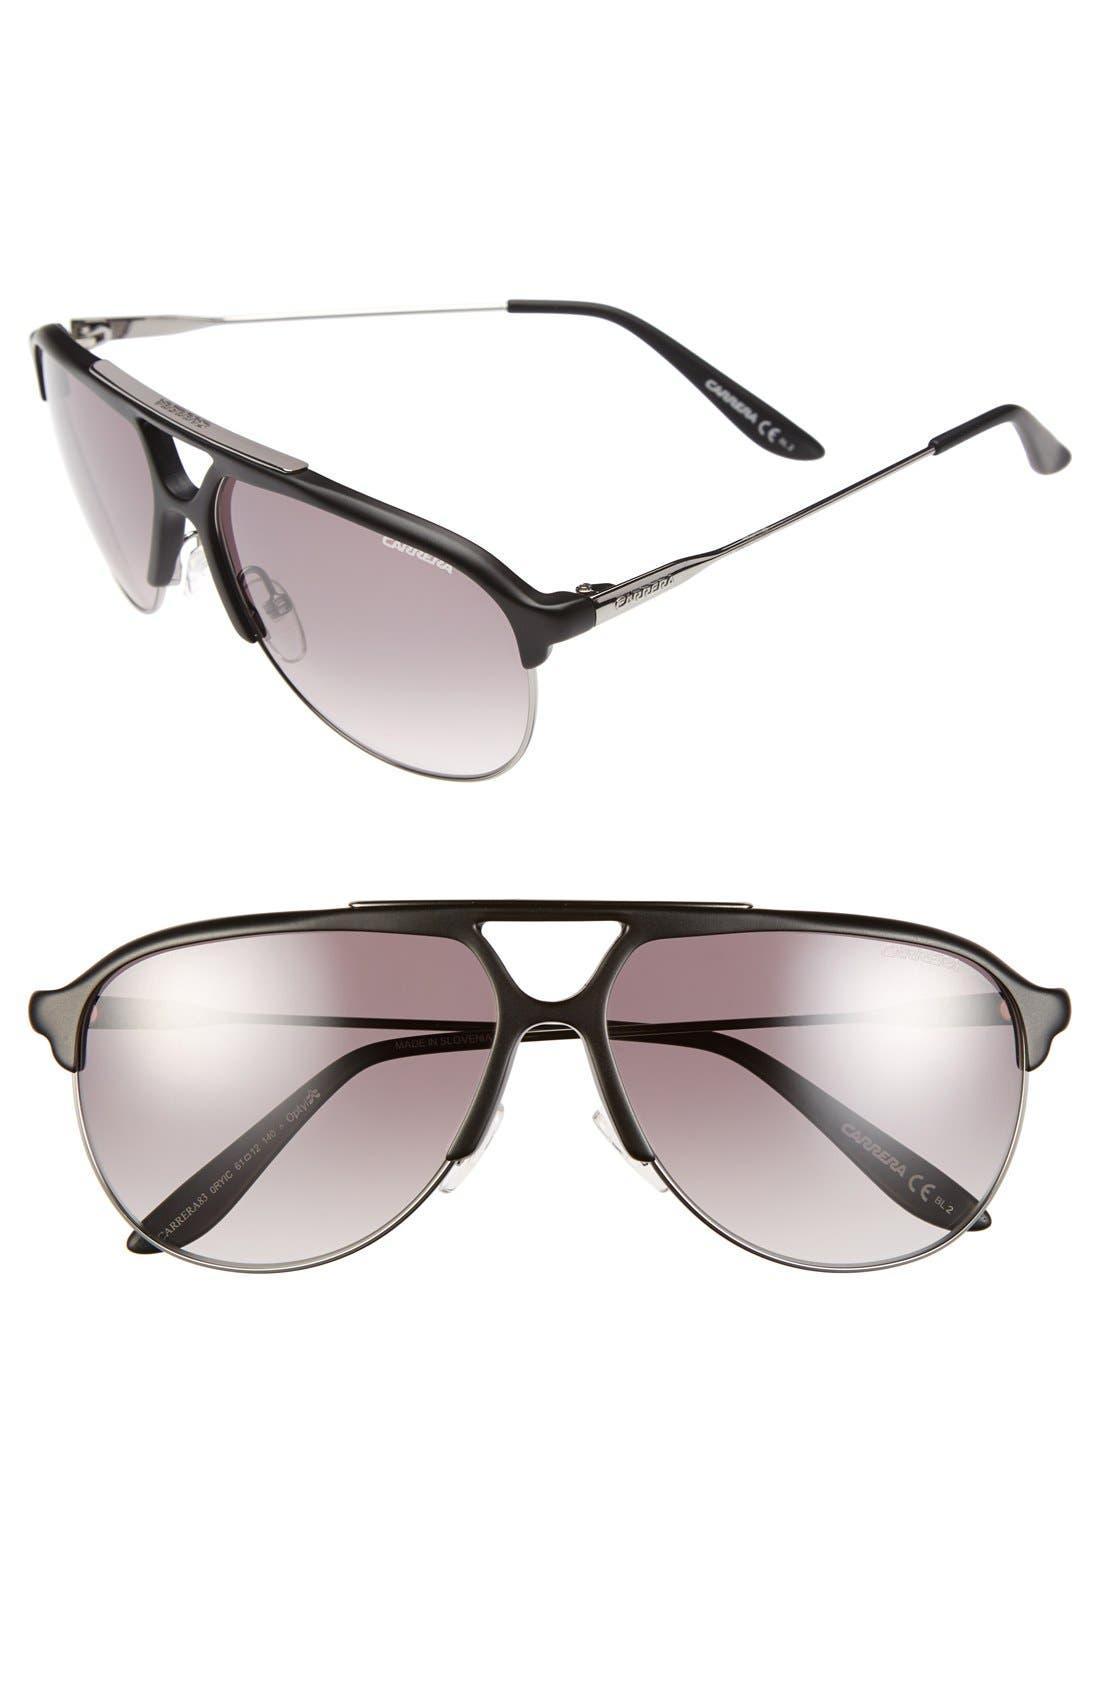 Main Image - Carrera Eyewear 61mm Sunglasses